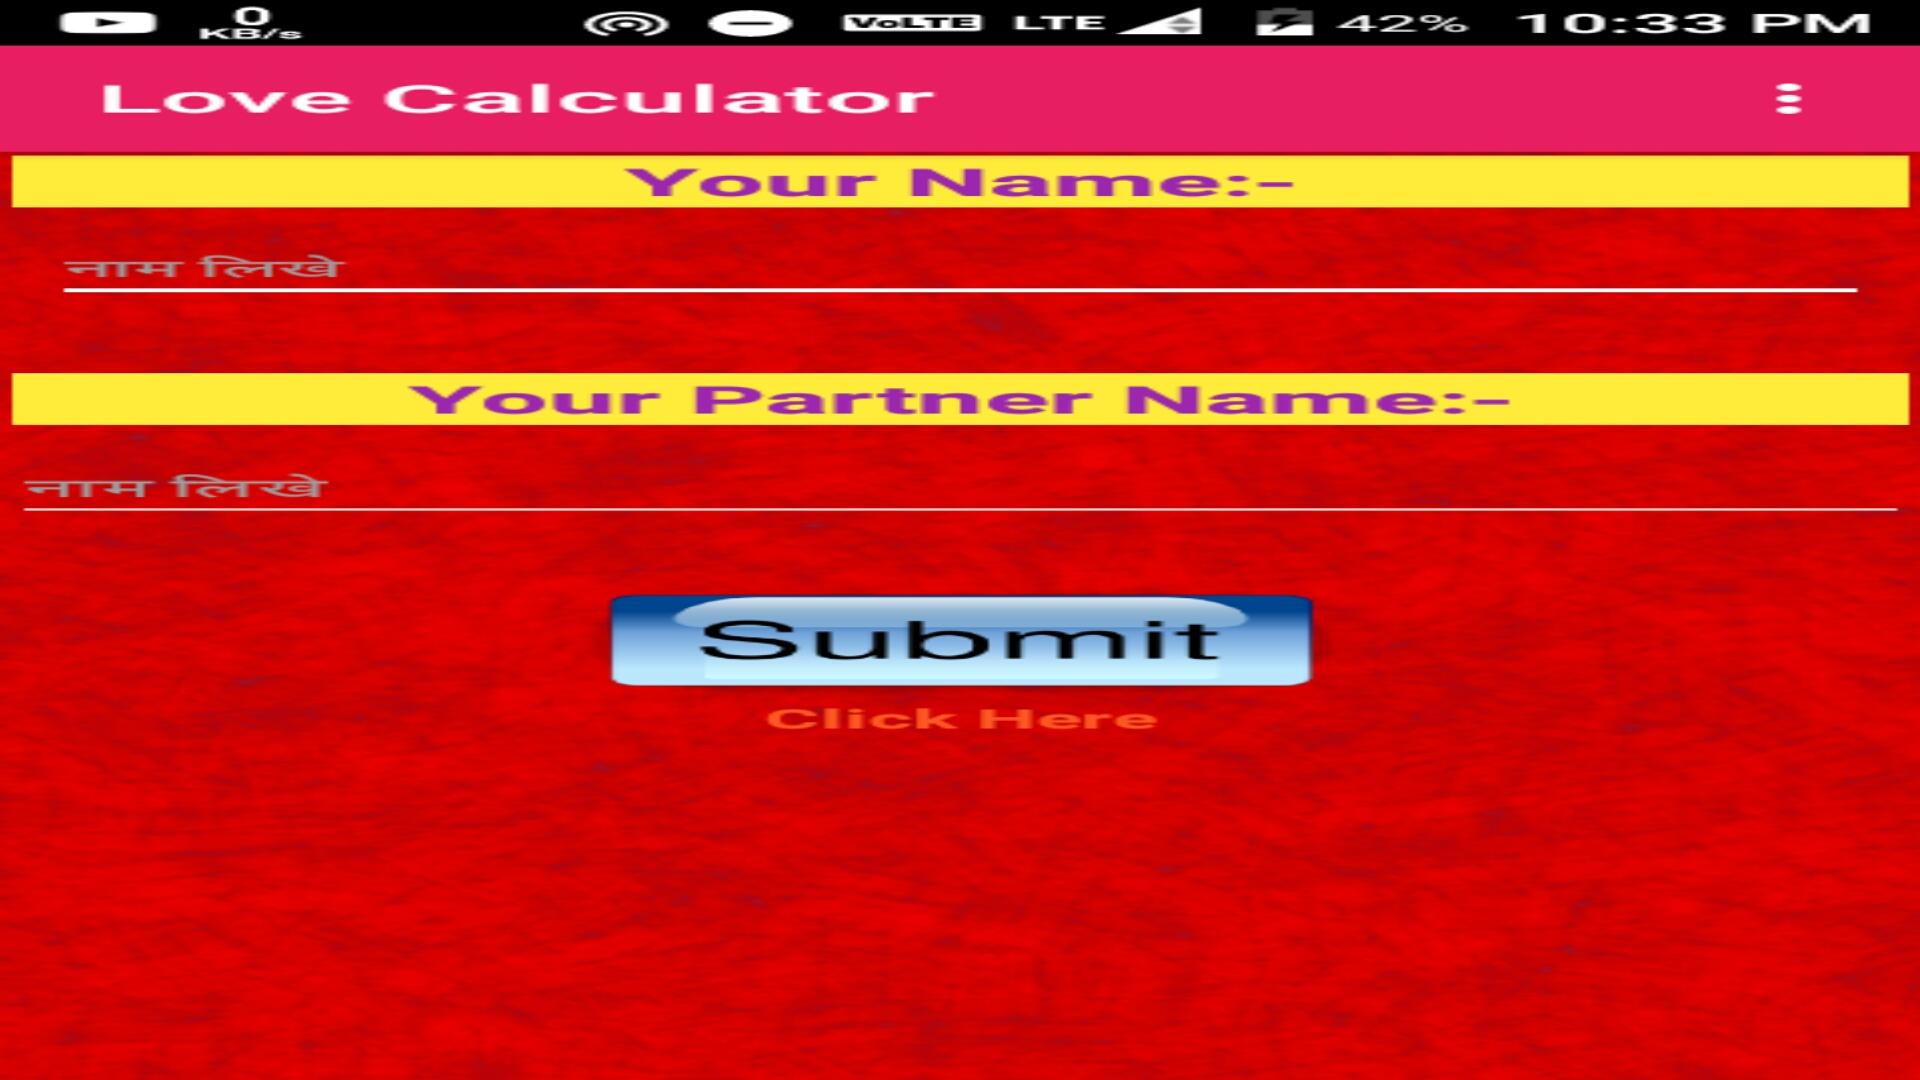 Amazon.com: Love Calculator: Appstore for Android